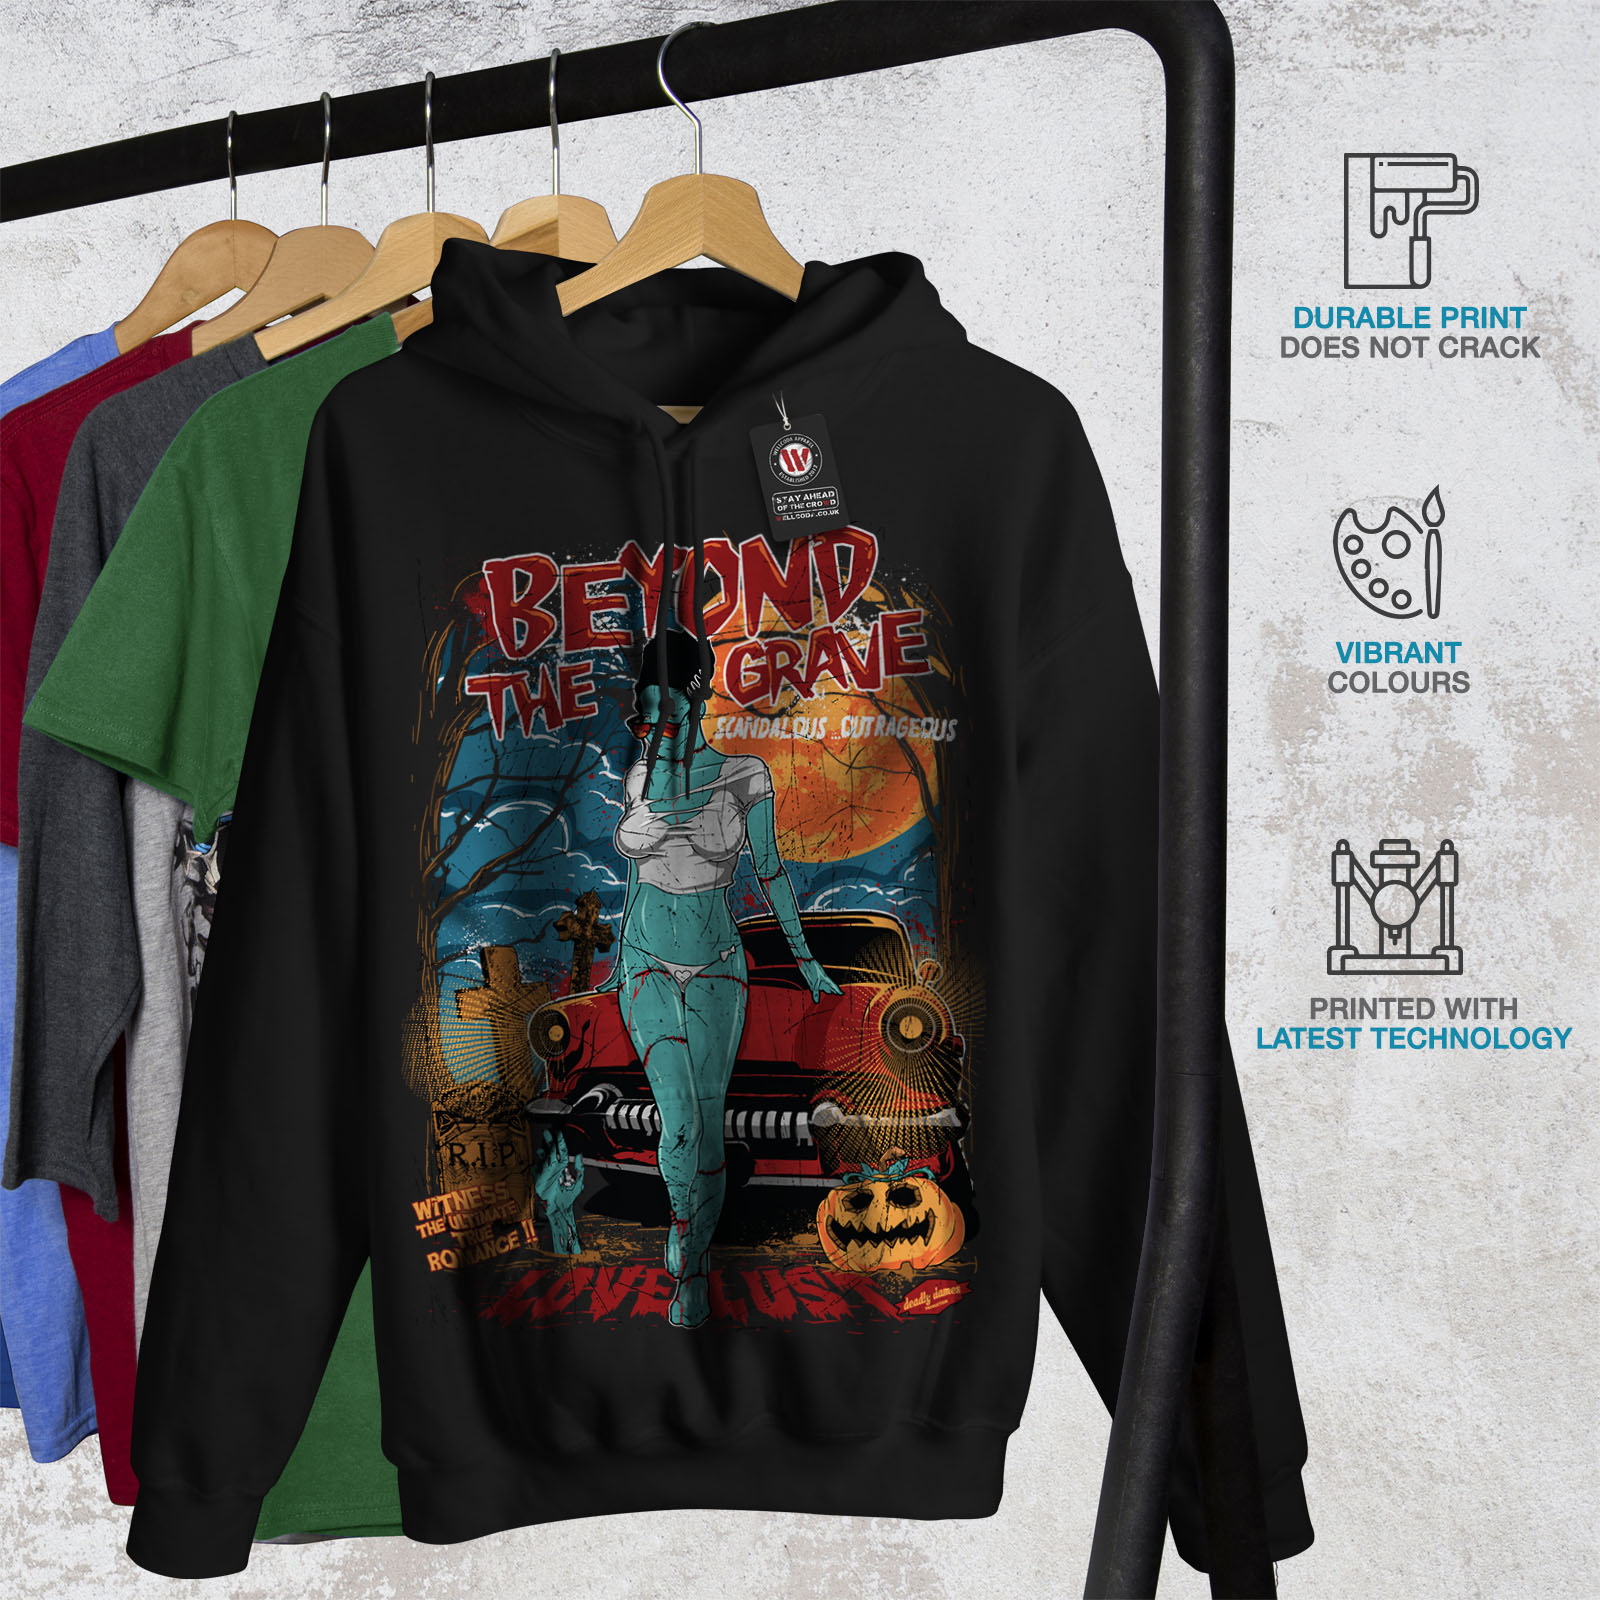 Casual Wellcoda Black New Sweatshirt Mens Hoodie Love Hooded 0rIwPrxq